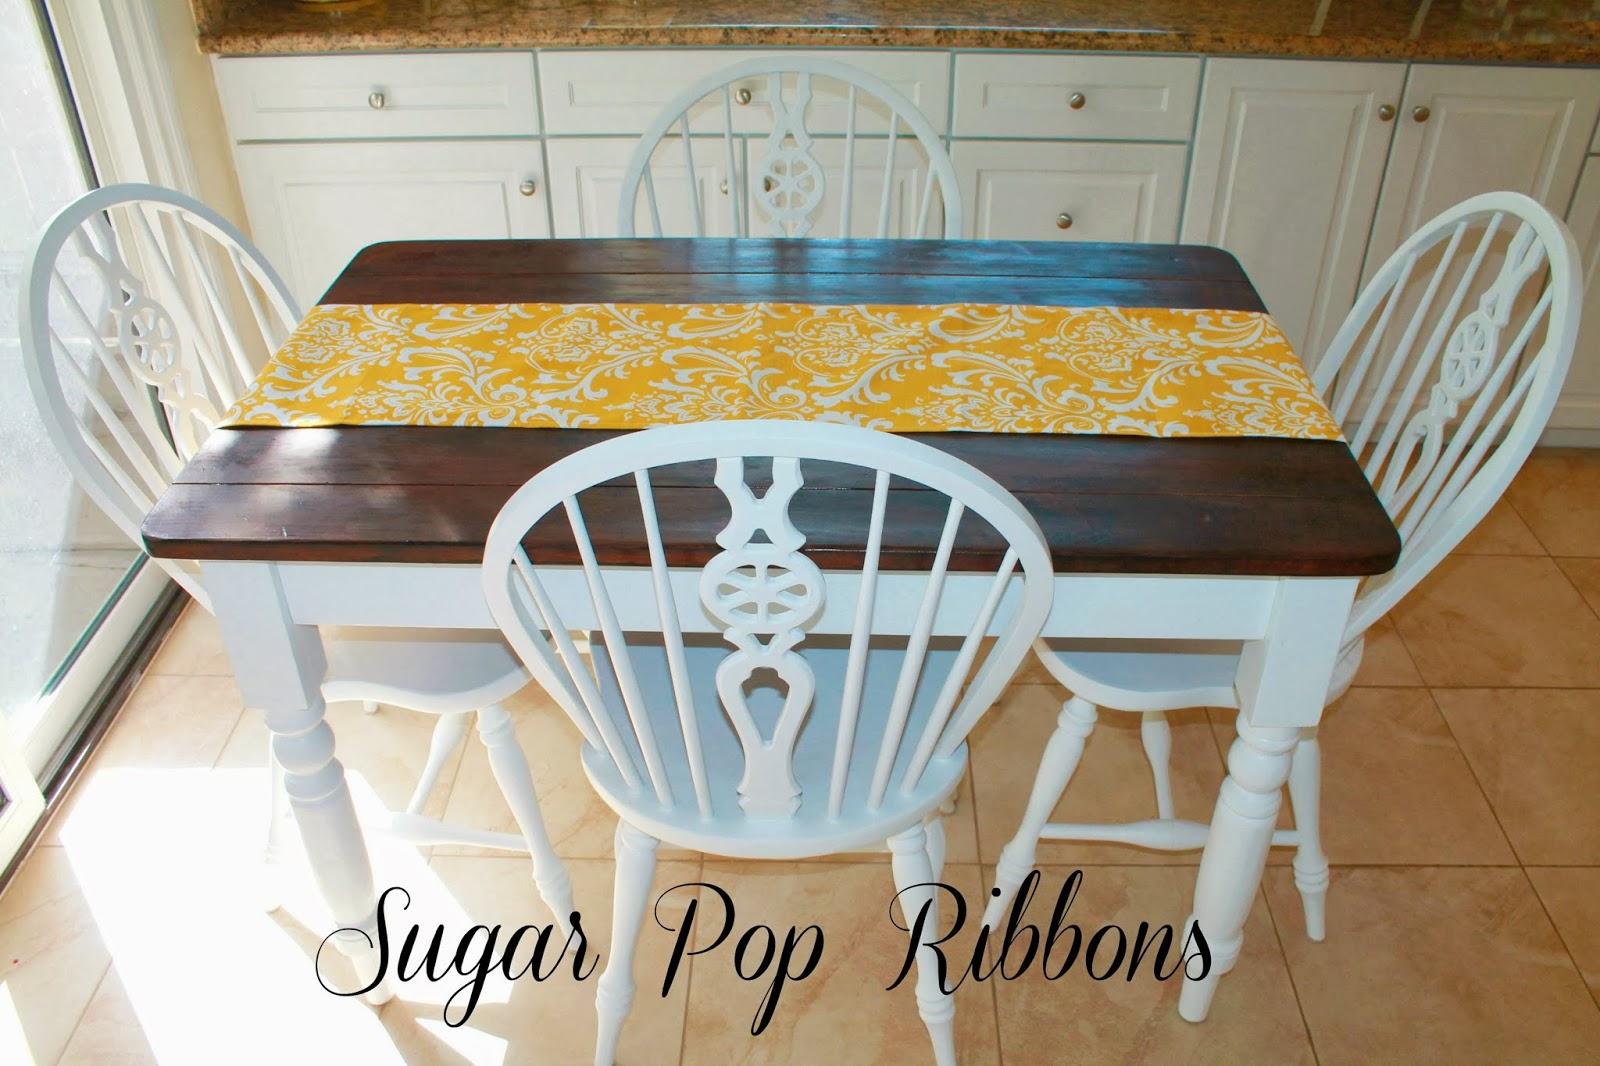 Sugar Pop Ribbons Reviews and Giveaways: DIY Dining Set Refinshing ...